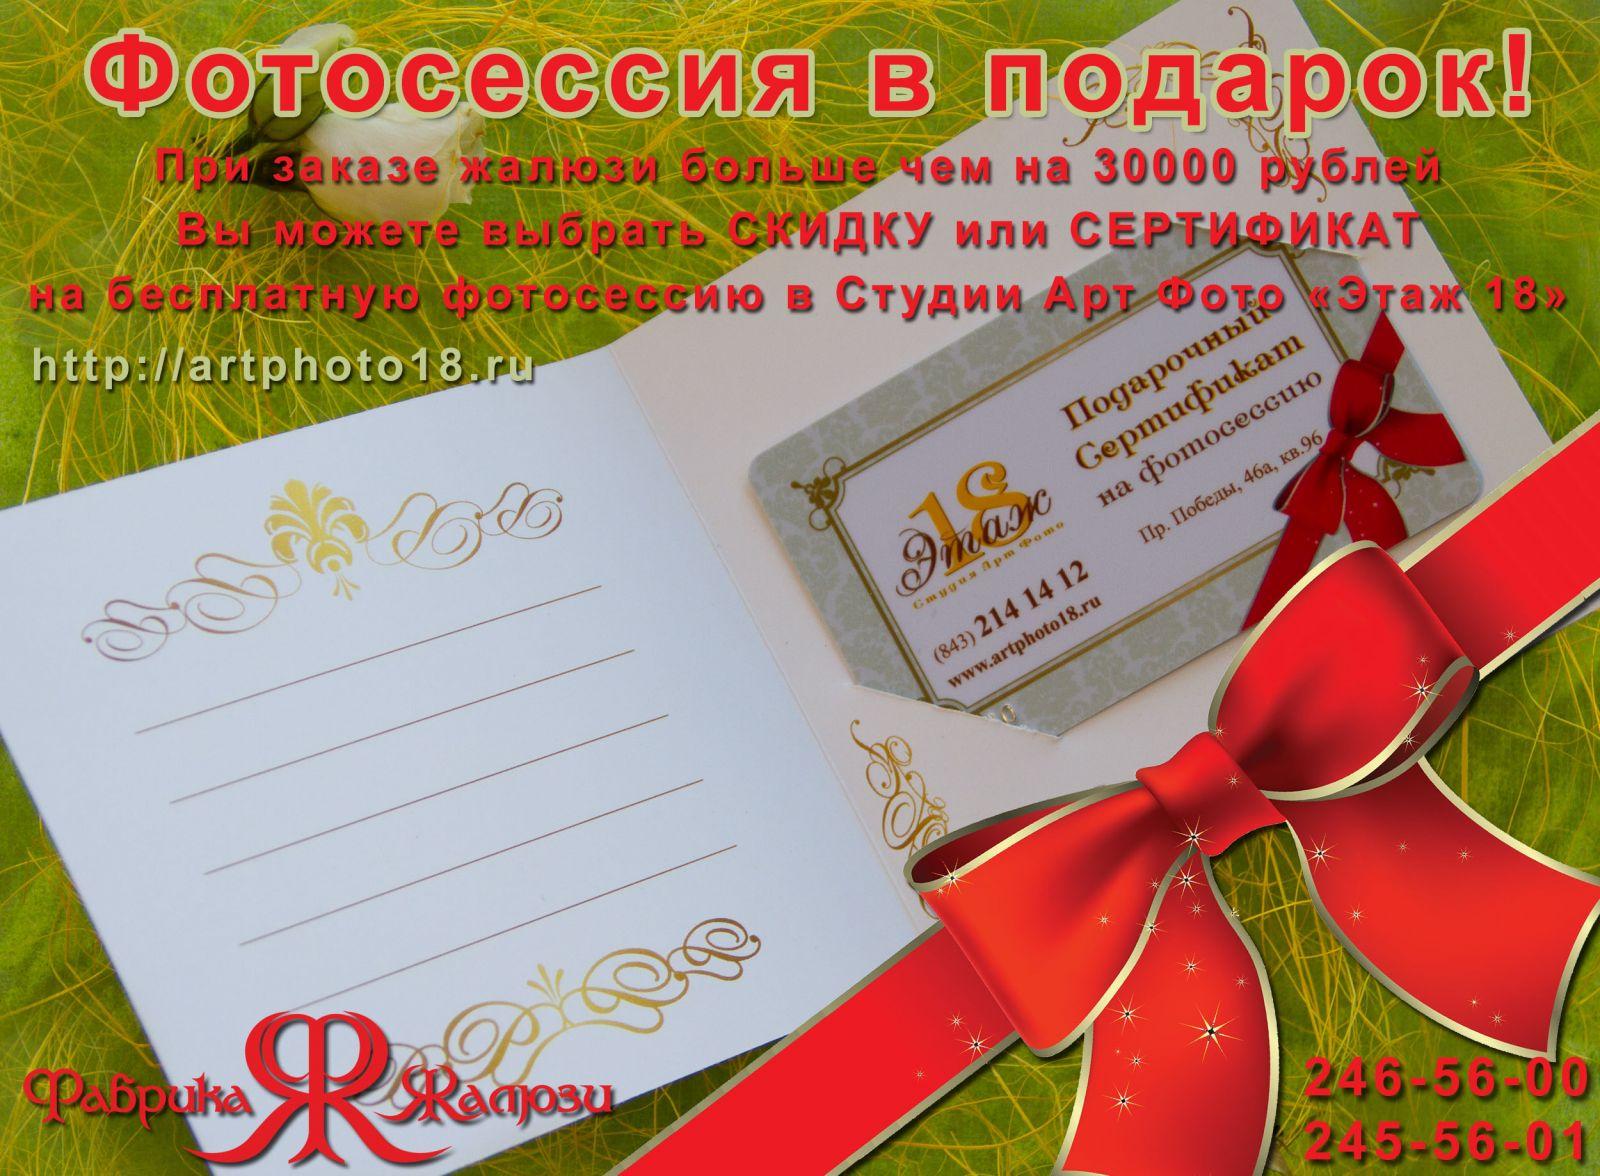 Фото сертификат на подарок